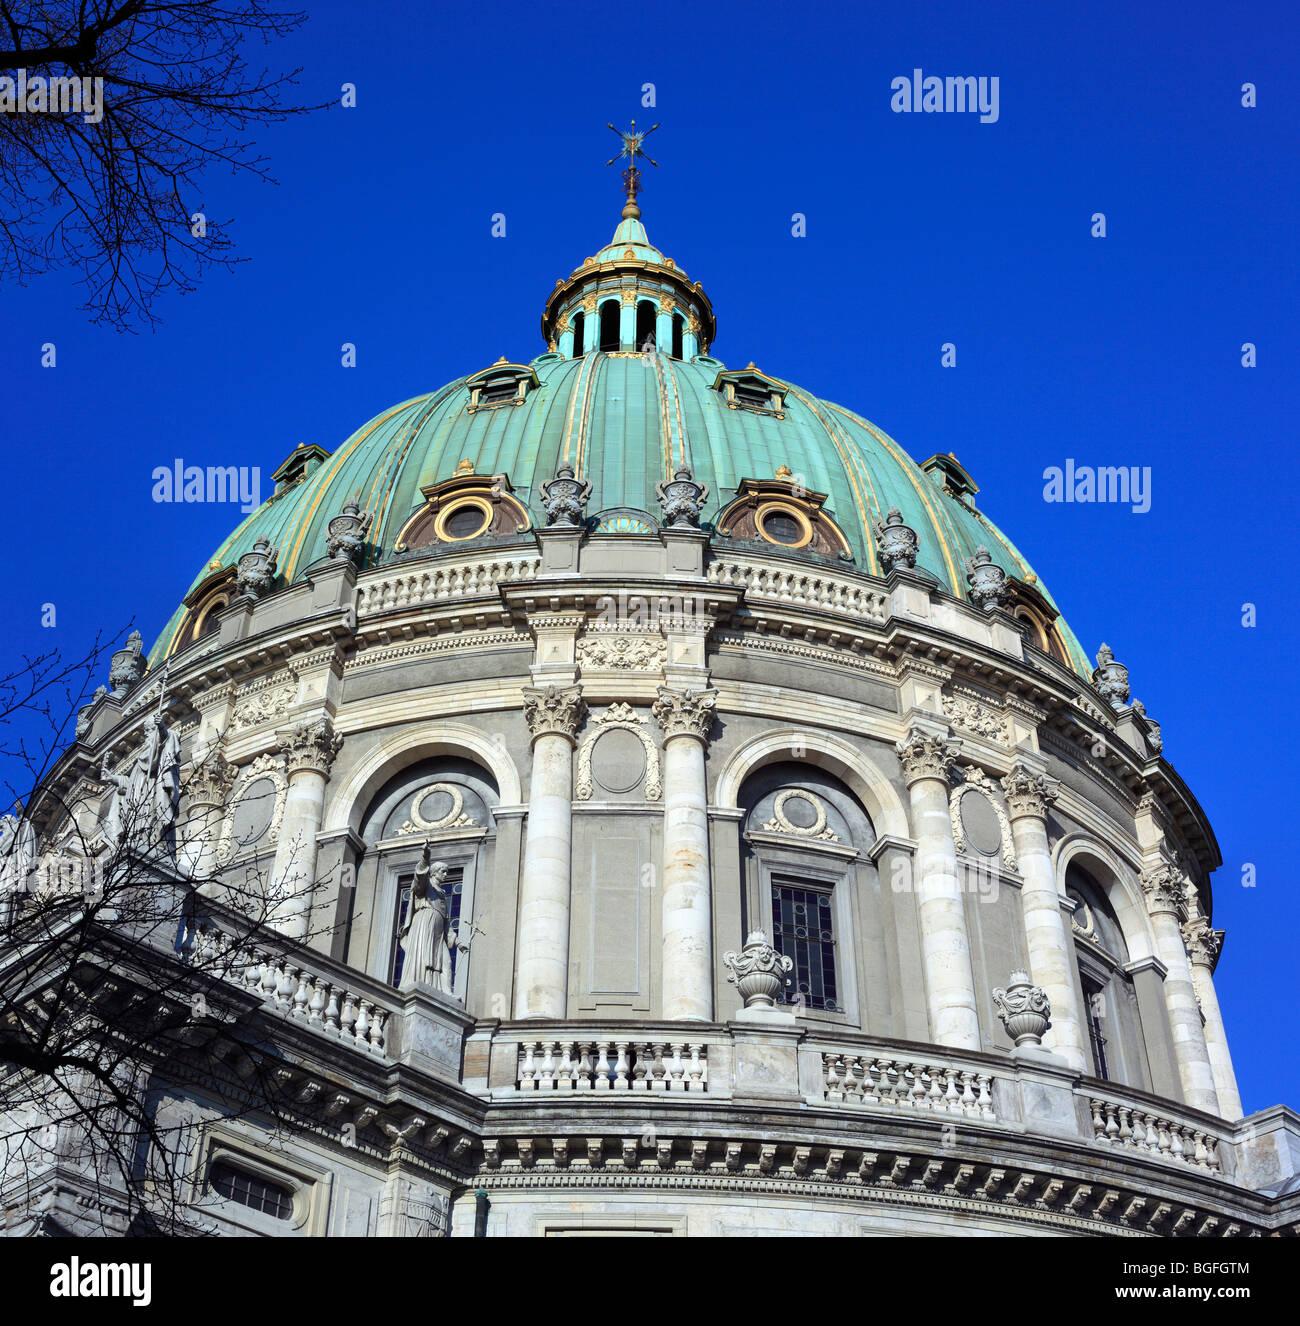 Frederik's Church (The Marble Church), Copenhagen, Denmark - Stock Image